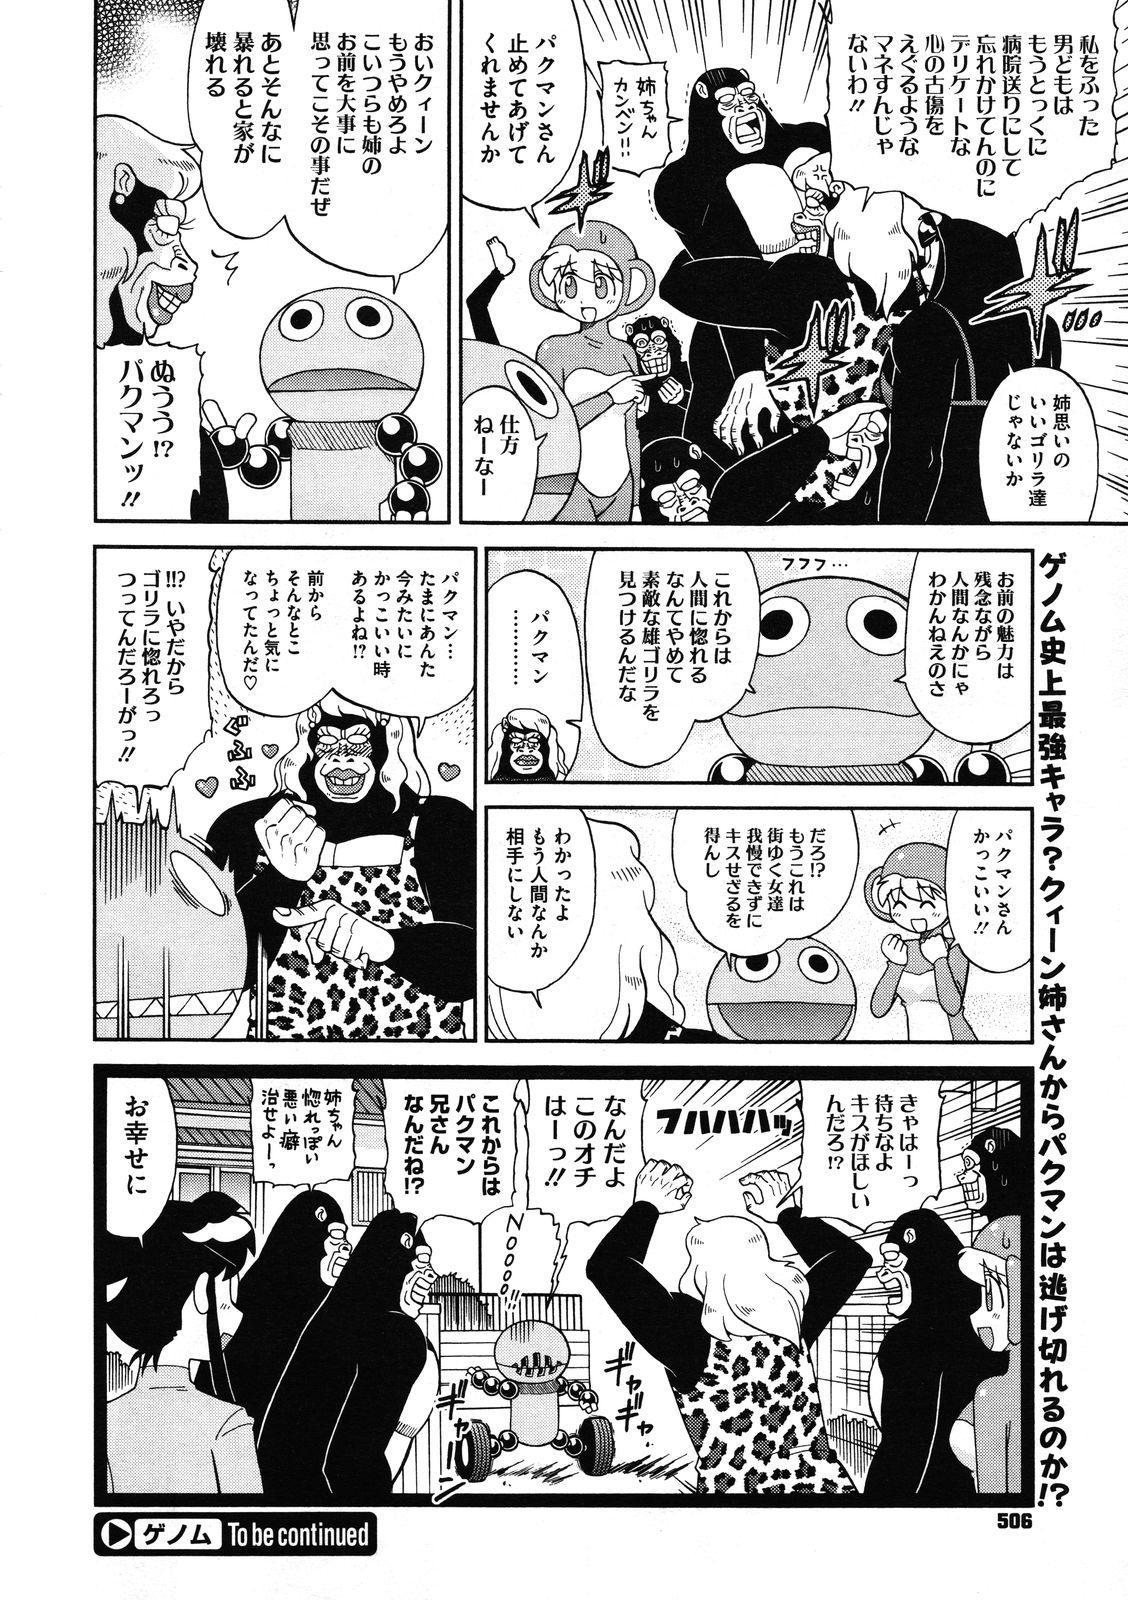 COMIC Megastore 2012-01 501